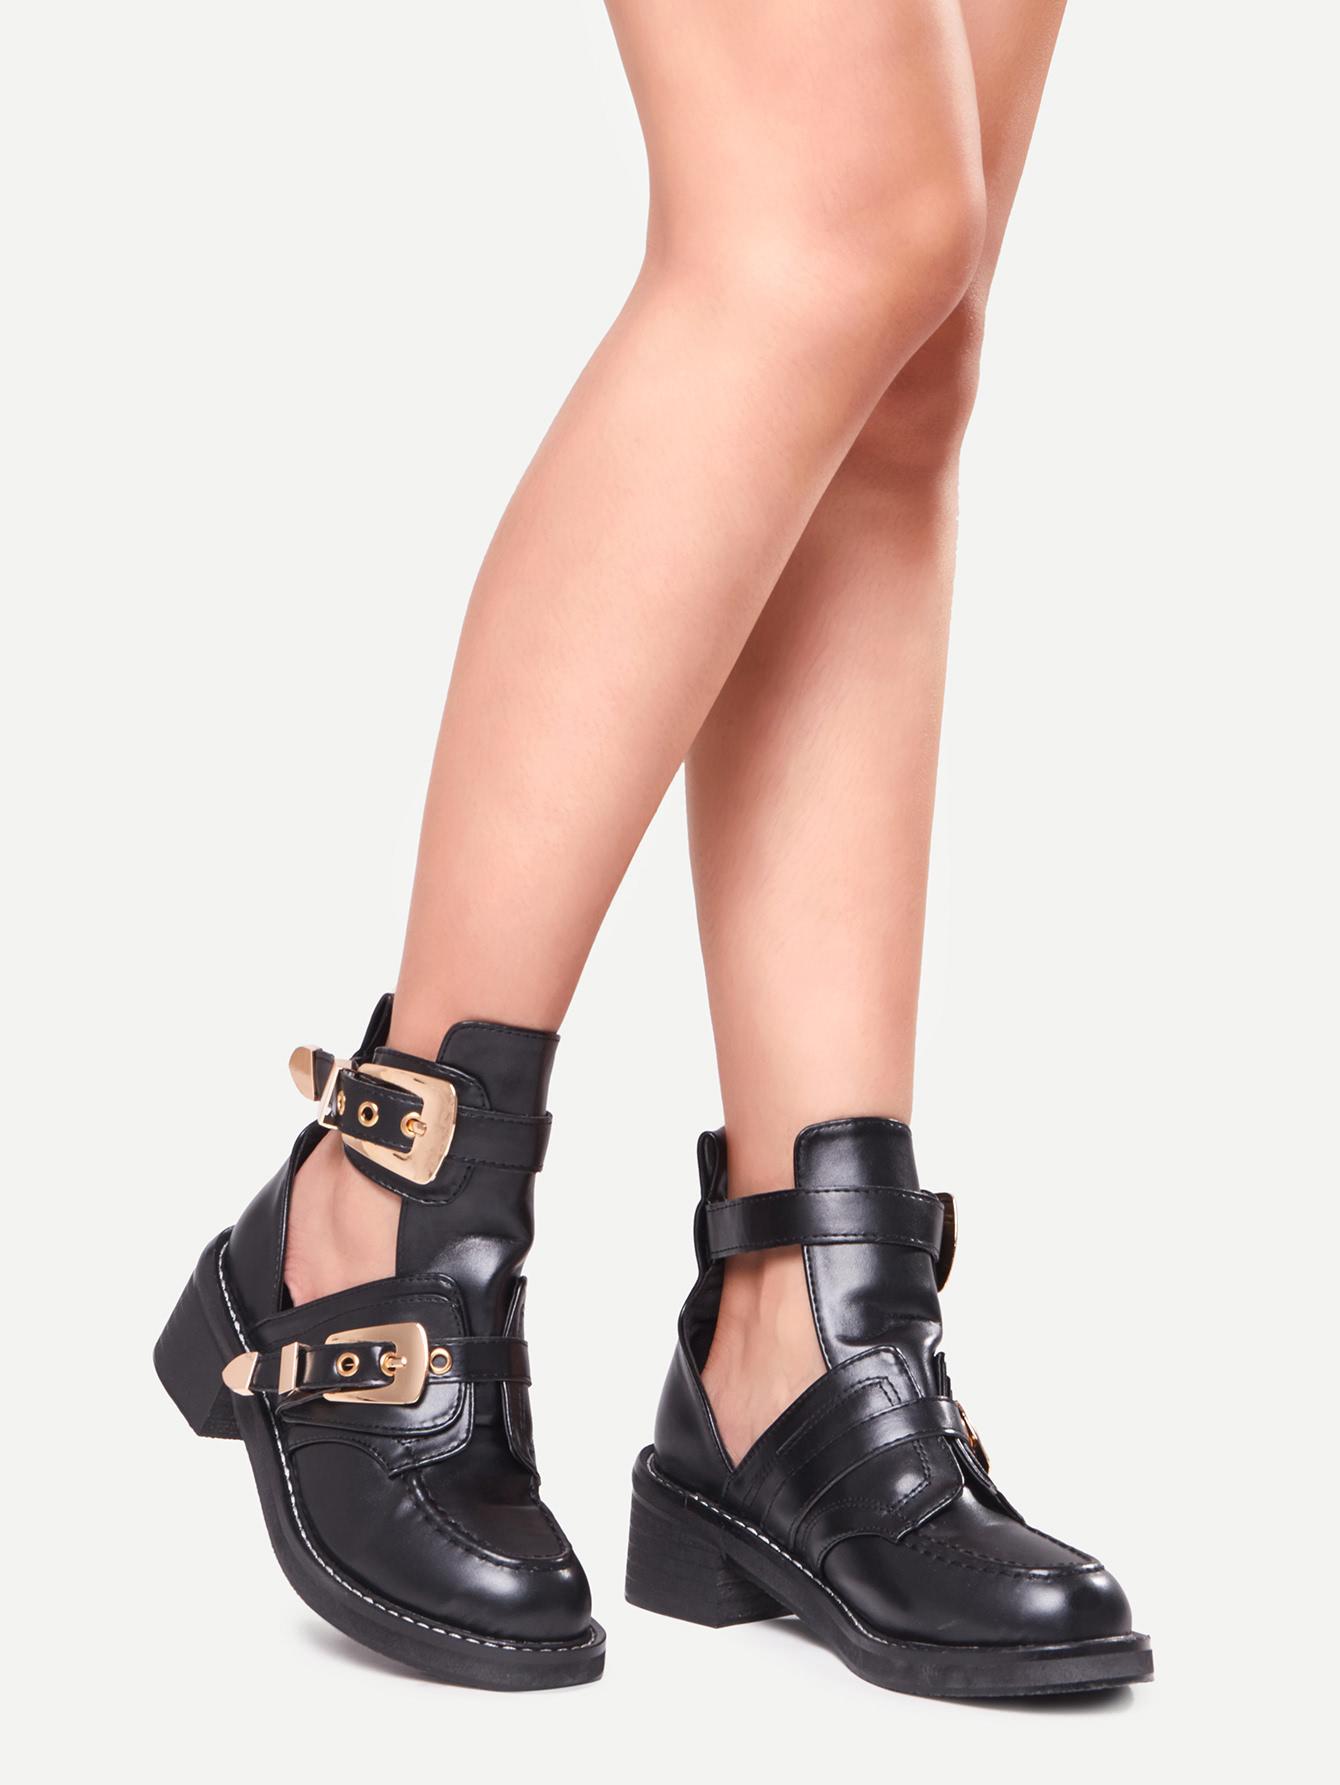 4e89fe20d3 Buckle Strap Chunky Heel Shoes -SheIn(Sheinside)